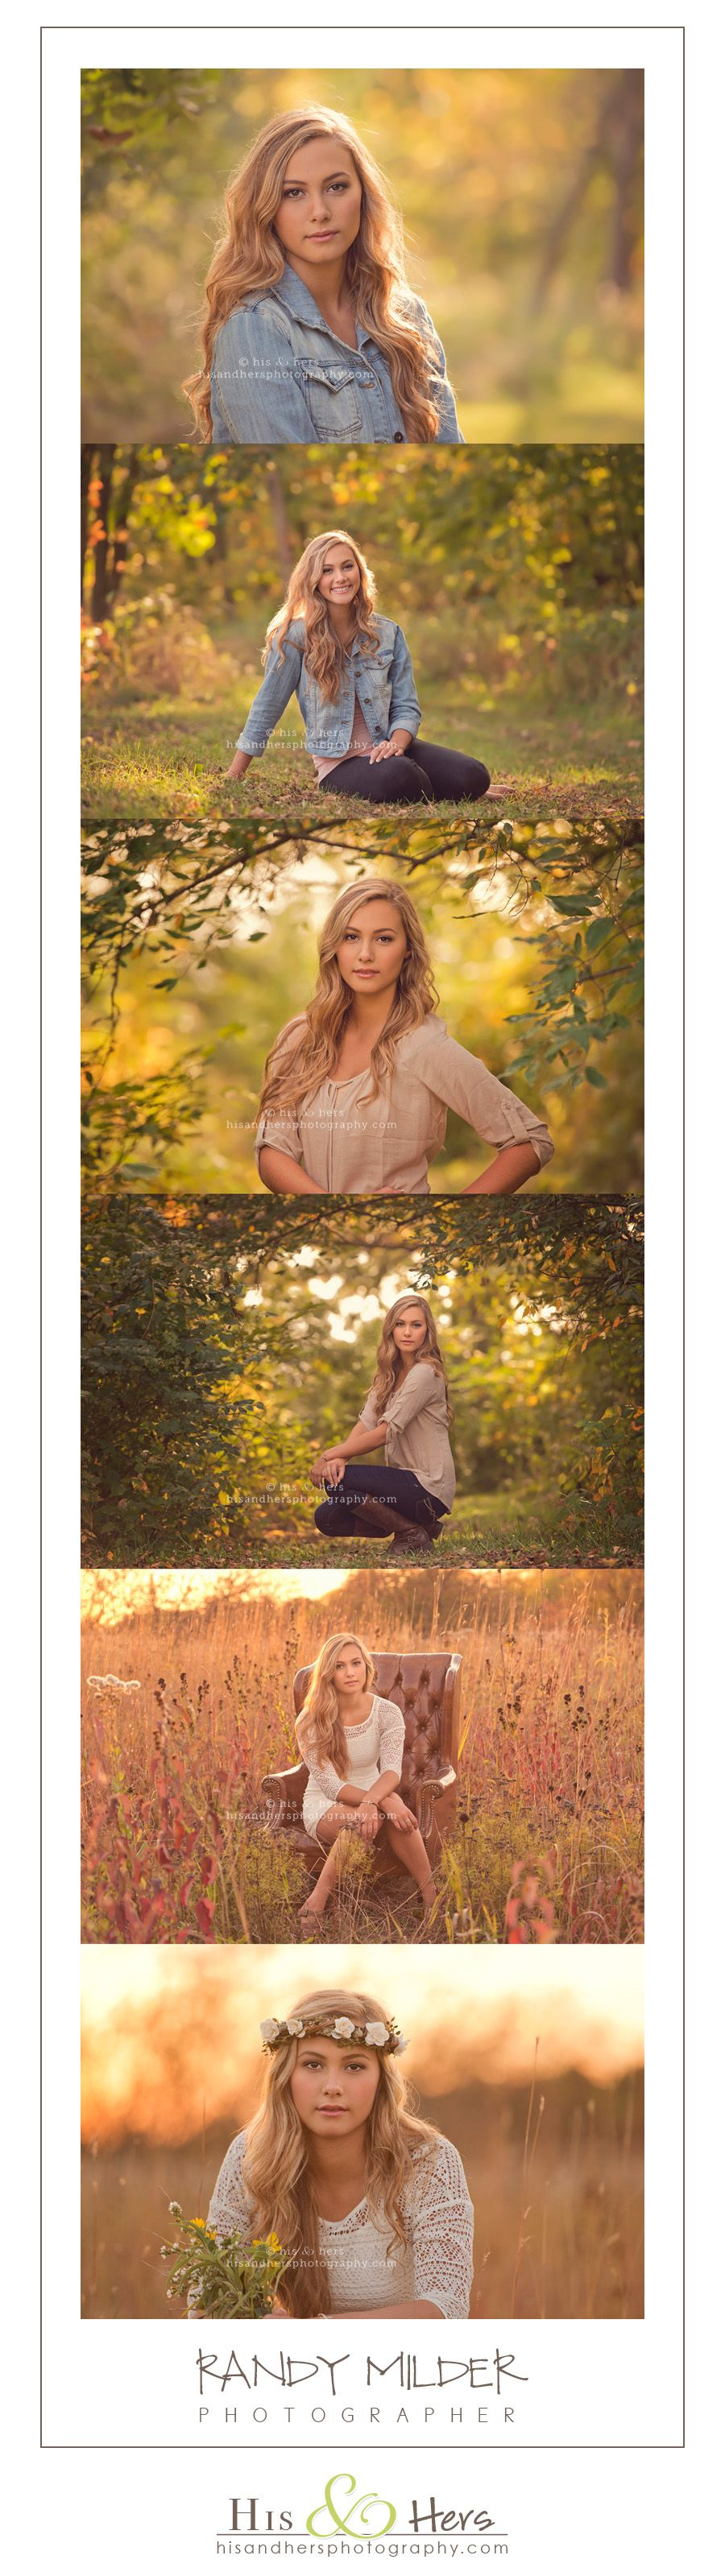 Senior pictures #photography [ IPromiseStudio.com ]